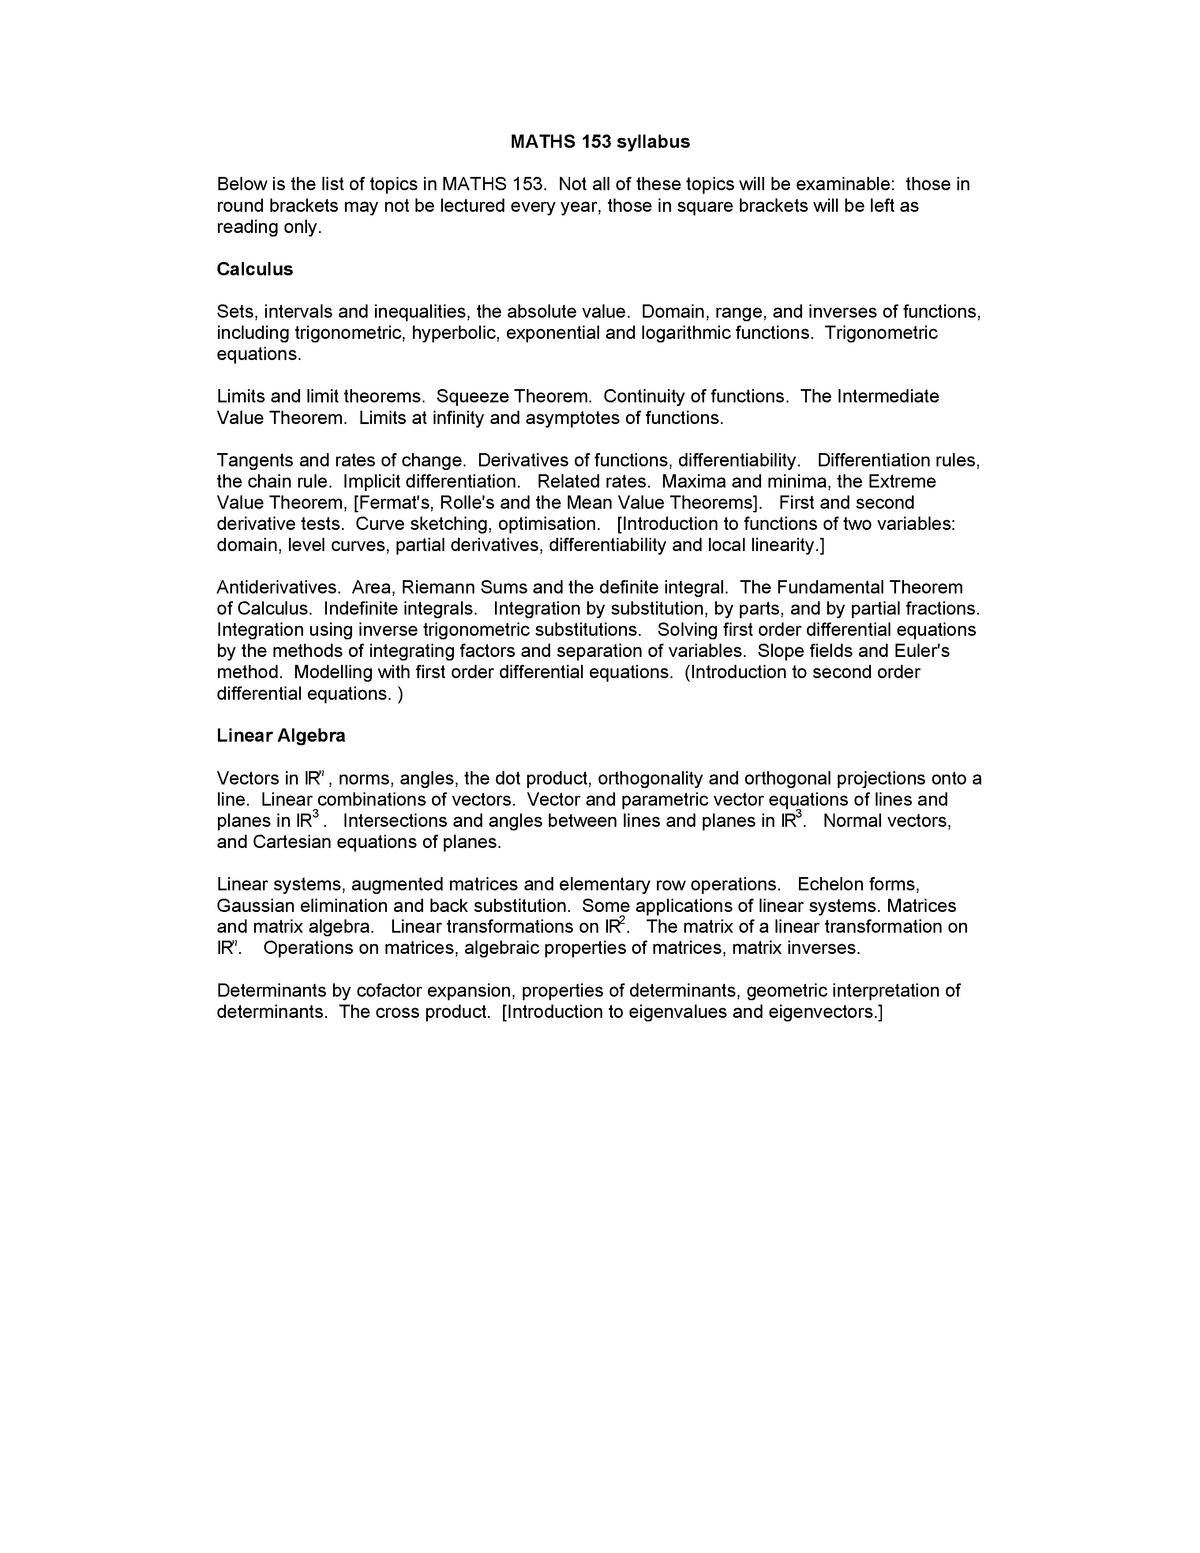 MAXSyllabus - Accelerated Mathematics MATHS153 - StuDocu